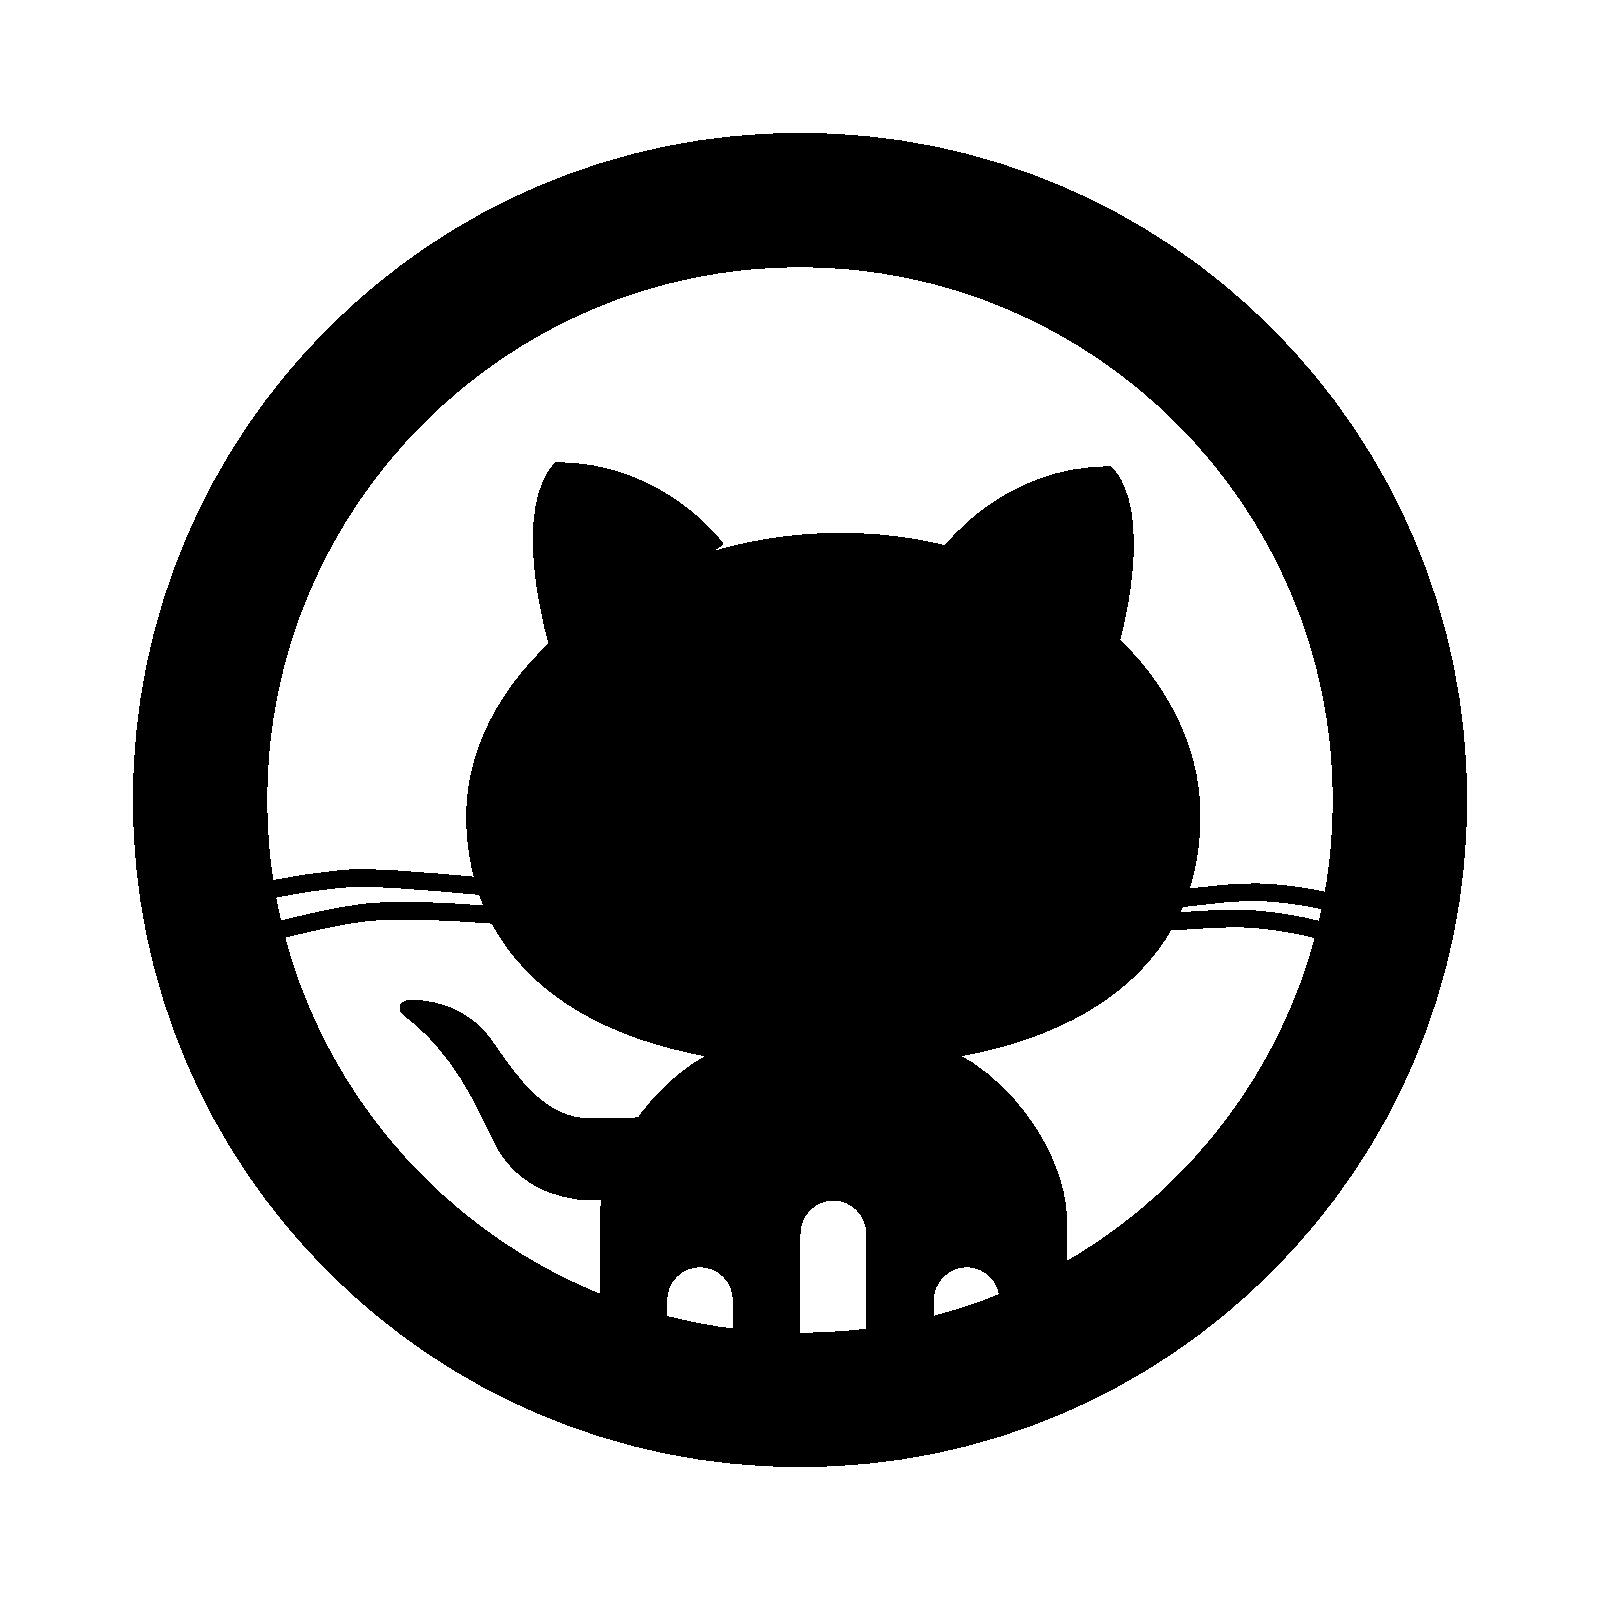 Github Octocat Logo Vector PNG - 37992